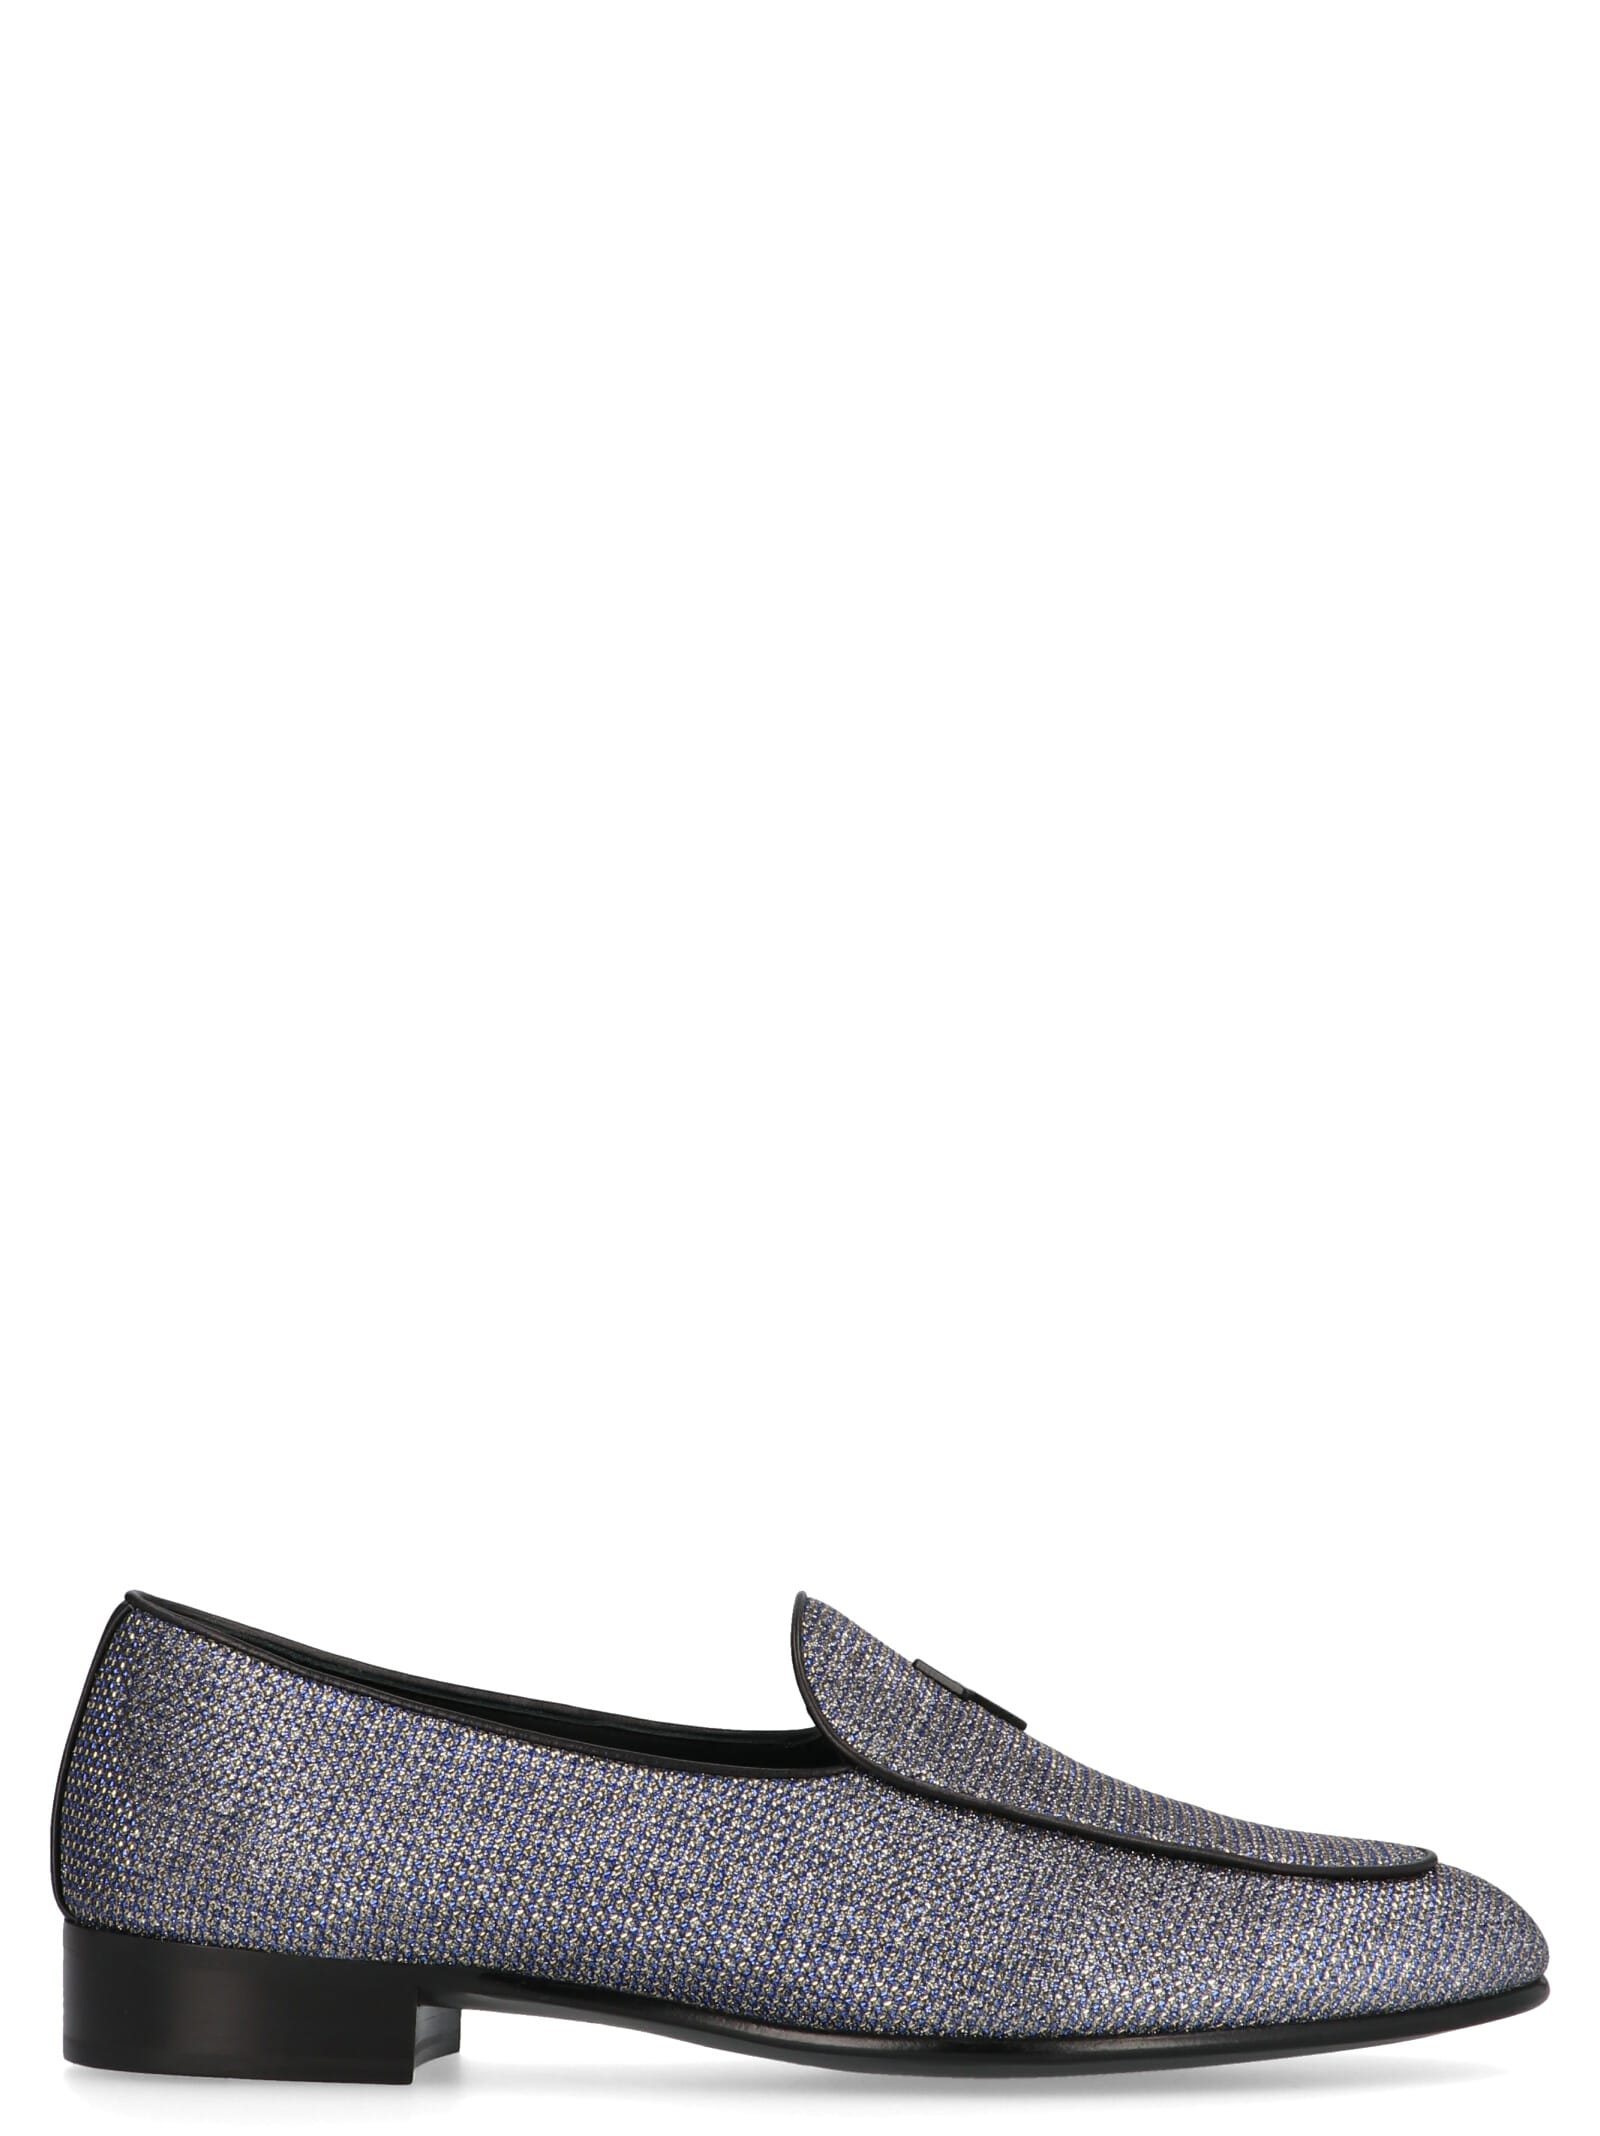 Giuseppe Zanotti cut Shoes